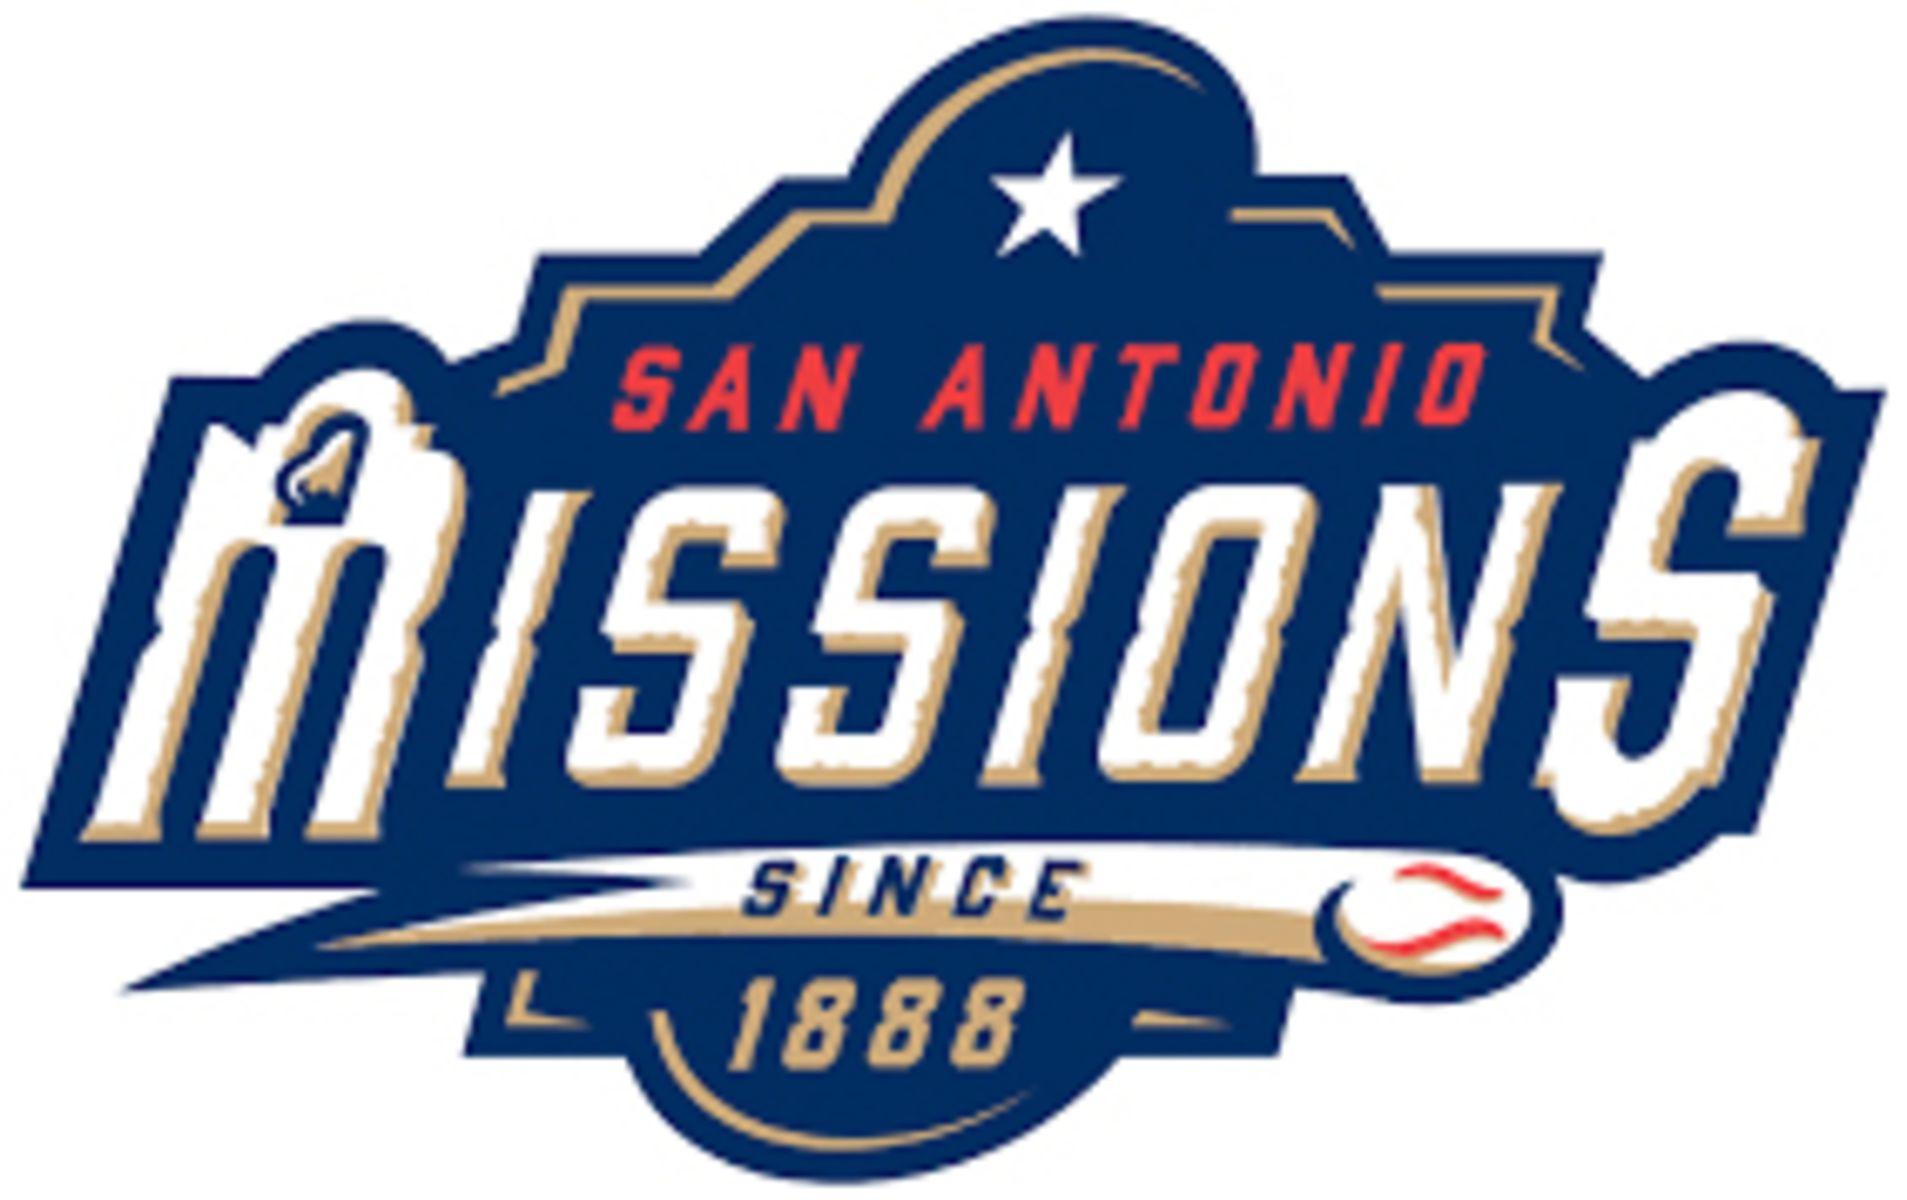 San Antonio Missions Schedule 2019 Auction Page | Swing Batter Batter